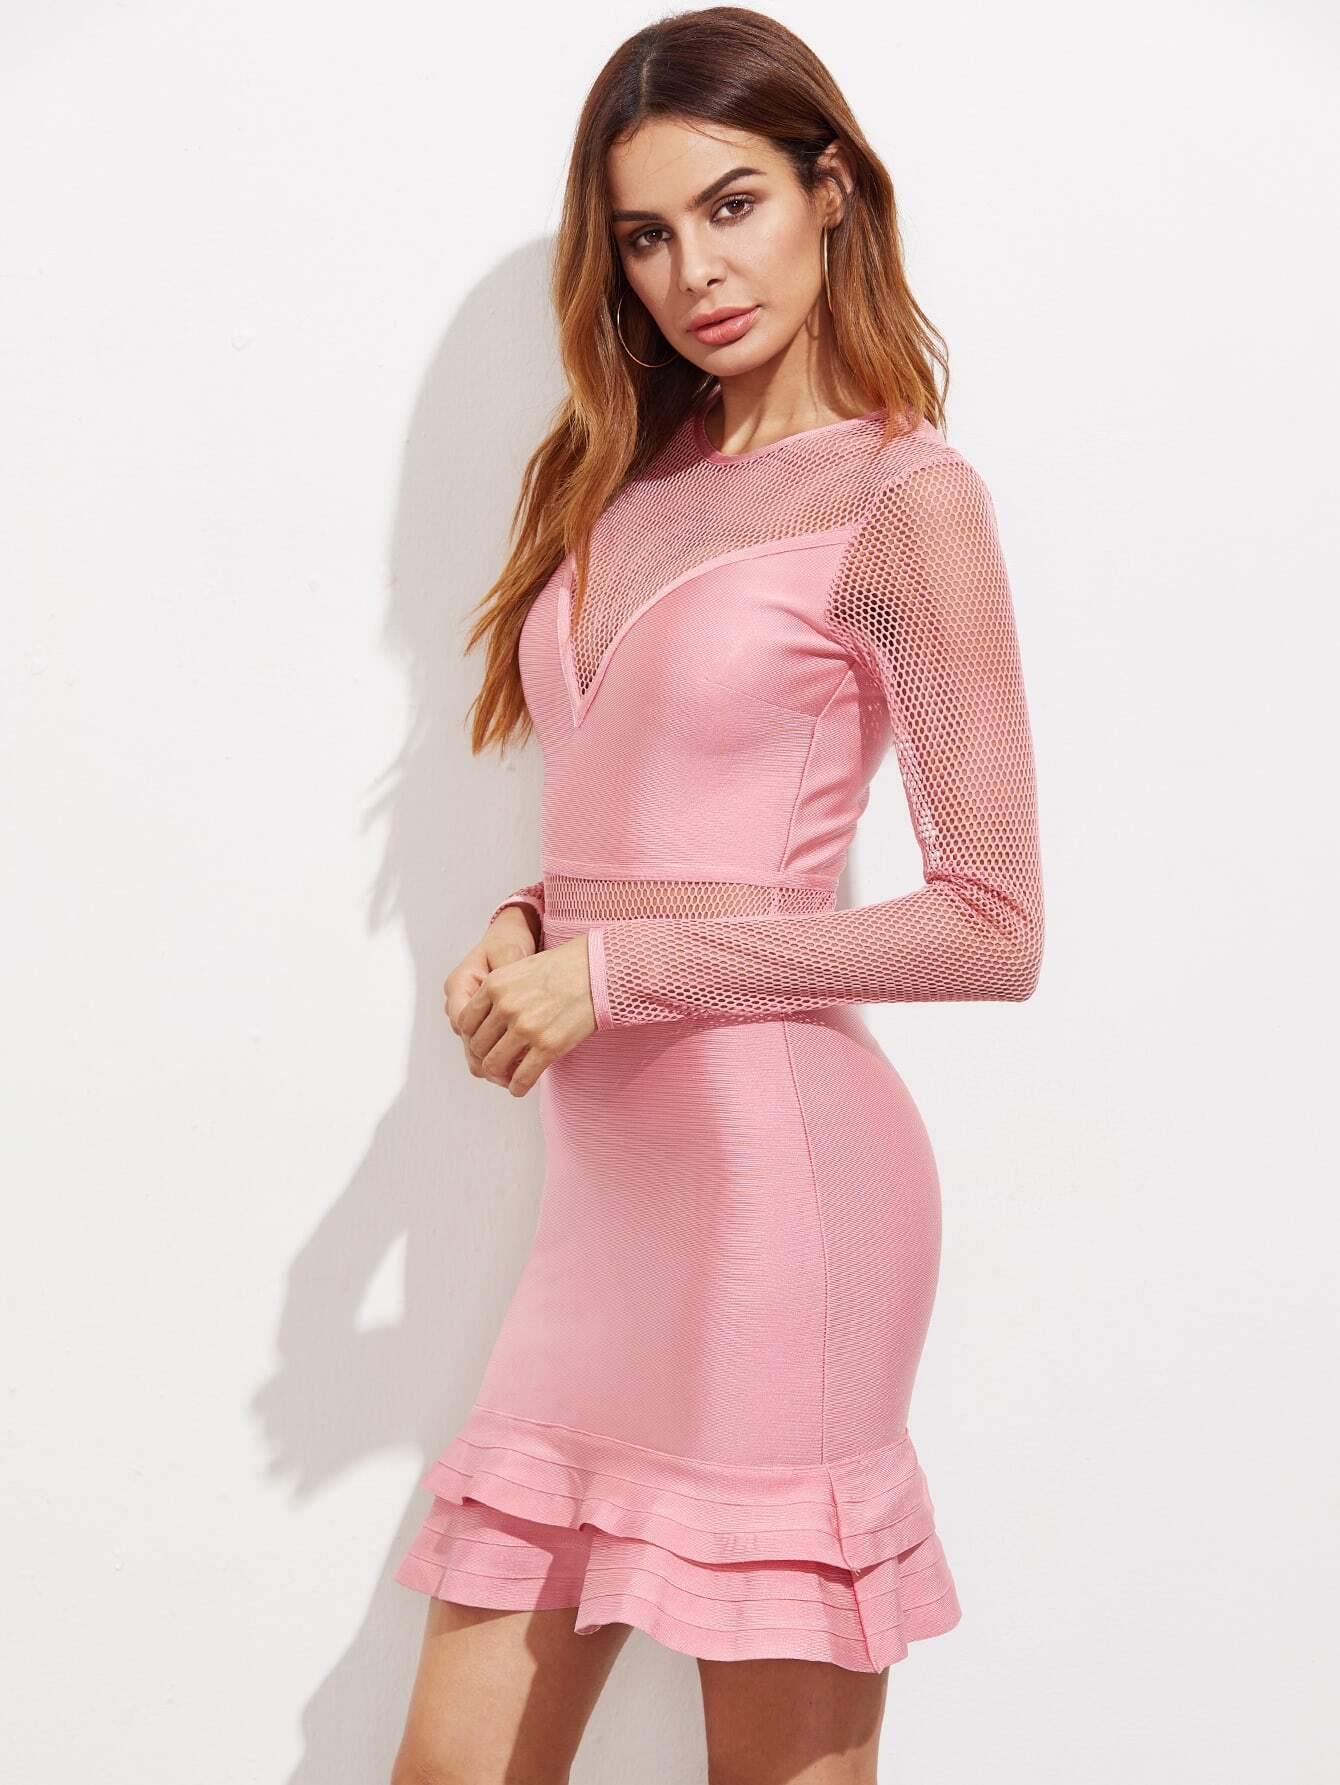 Fishnet Insert Layered Ruffle Hem Dress dress170508406